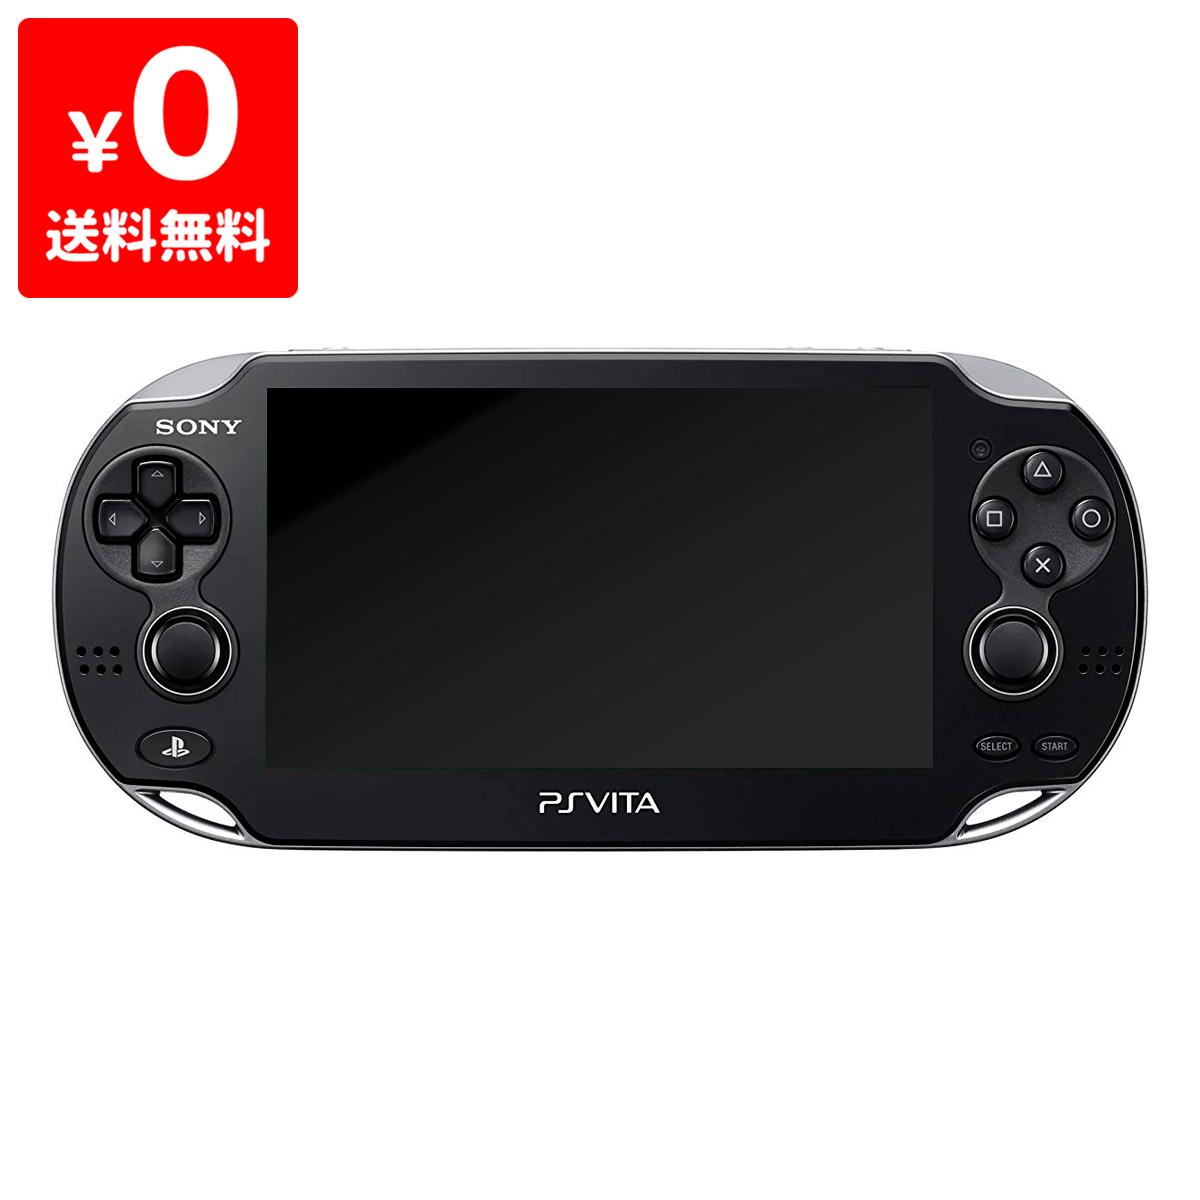 PSVITA プレイステーションヴィータ PSVita PlayStation Vita 3G お得 Wi-Fiモデル クリスタル ブラック PlayStationVita 中古 PCH-1100AB01 ソニー 本体のみ 4948872412940 SONY SALE開催中 限定版